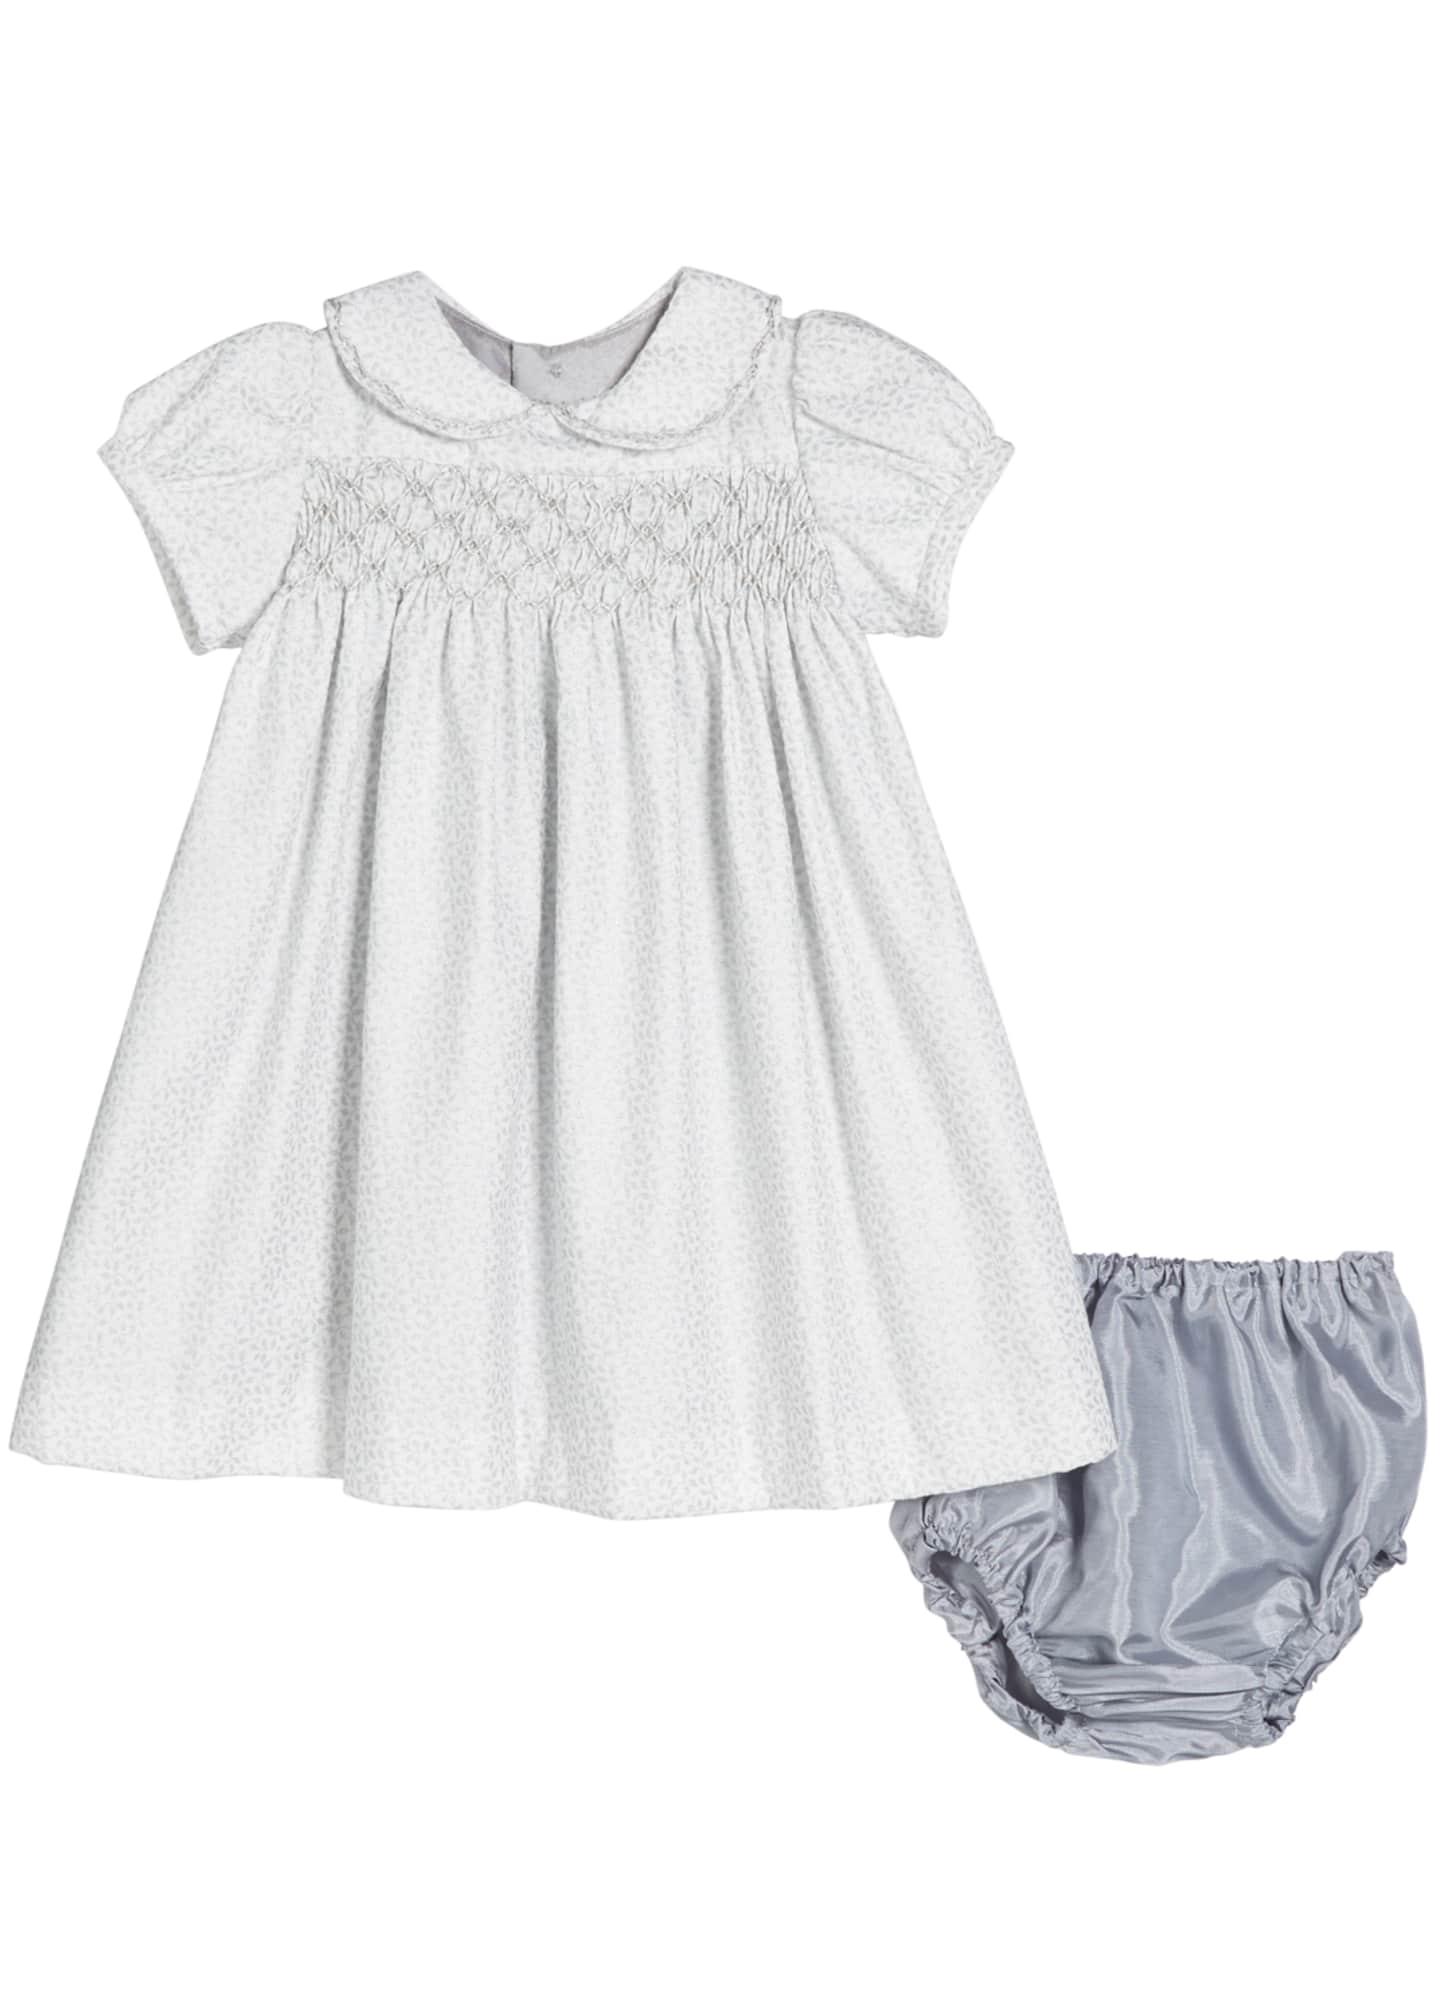 Isabel Garreton Vines-Print Short-Sleeve Dress, Size 2T-4T